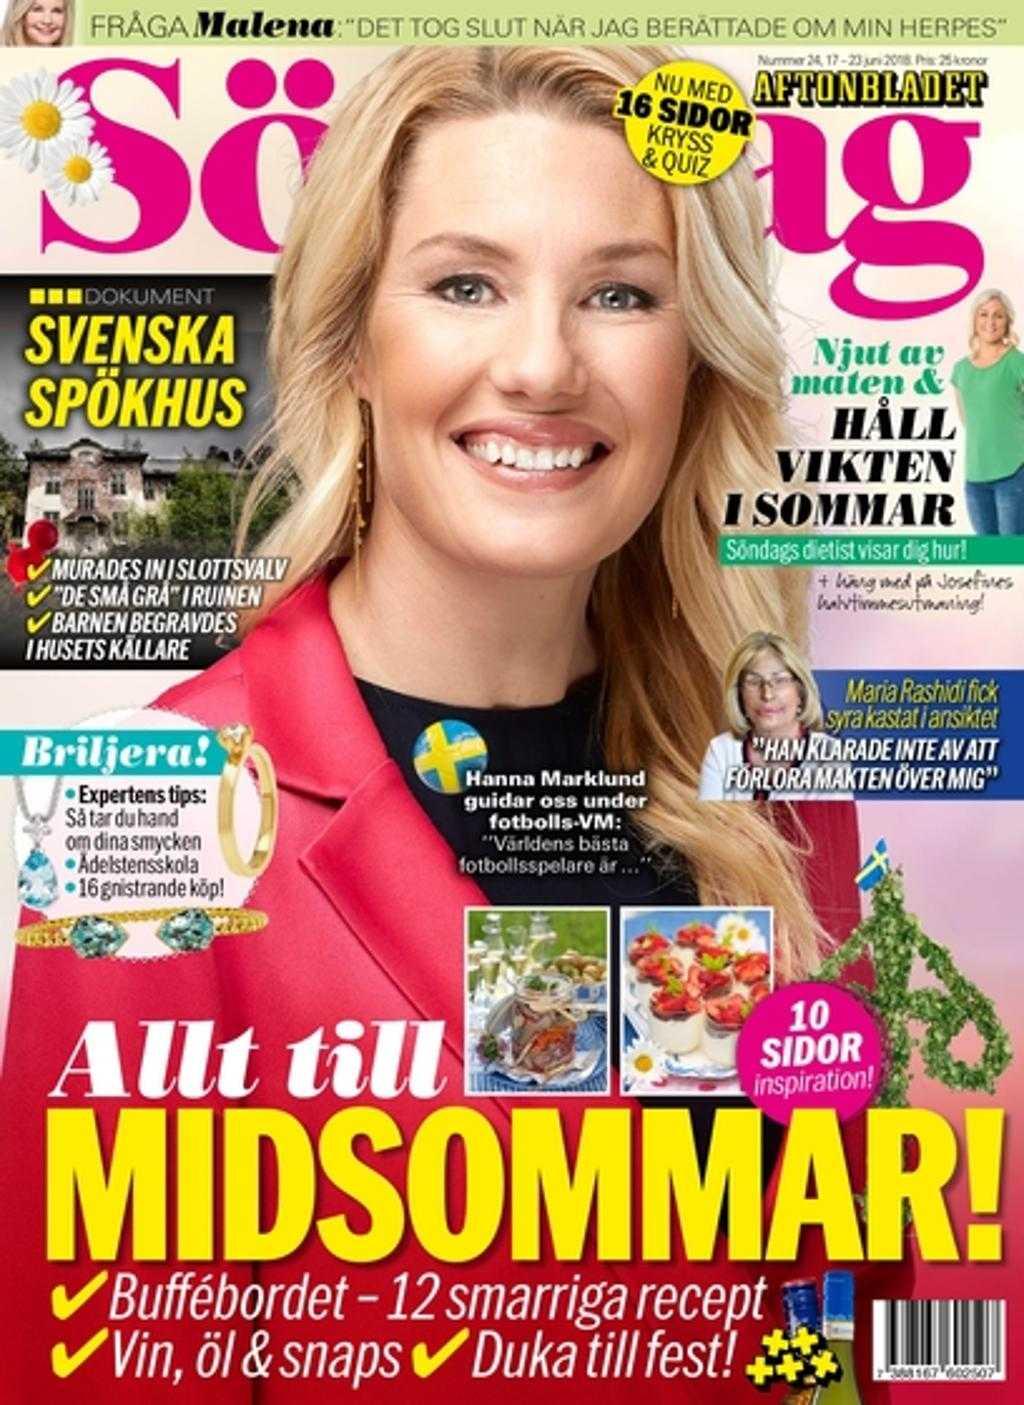 a5774fef7 Söndag | Aftonbladet